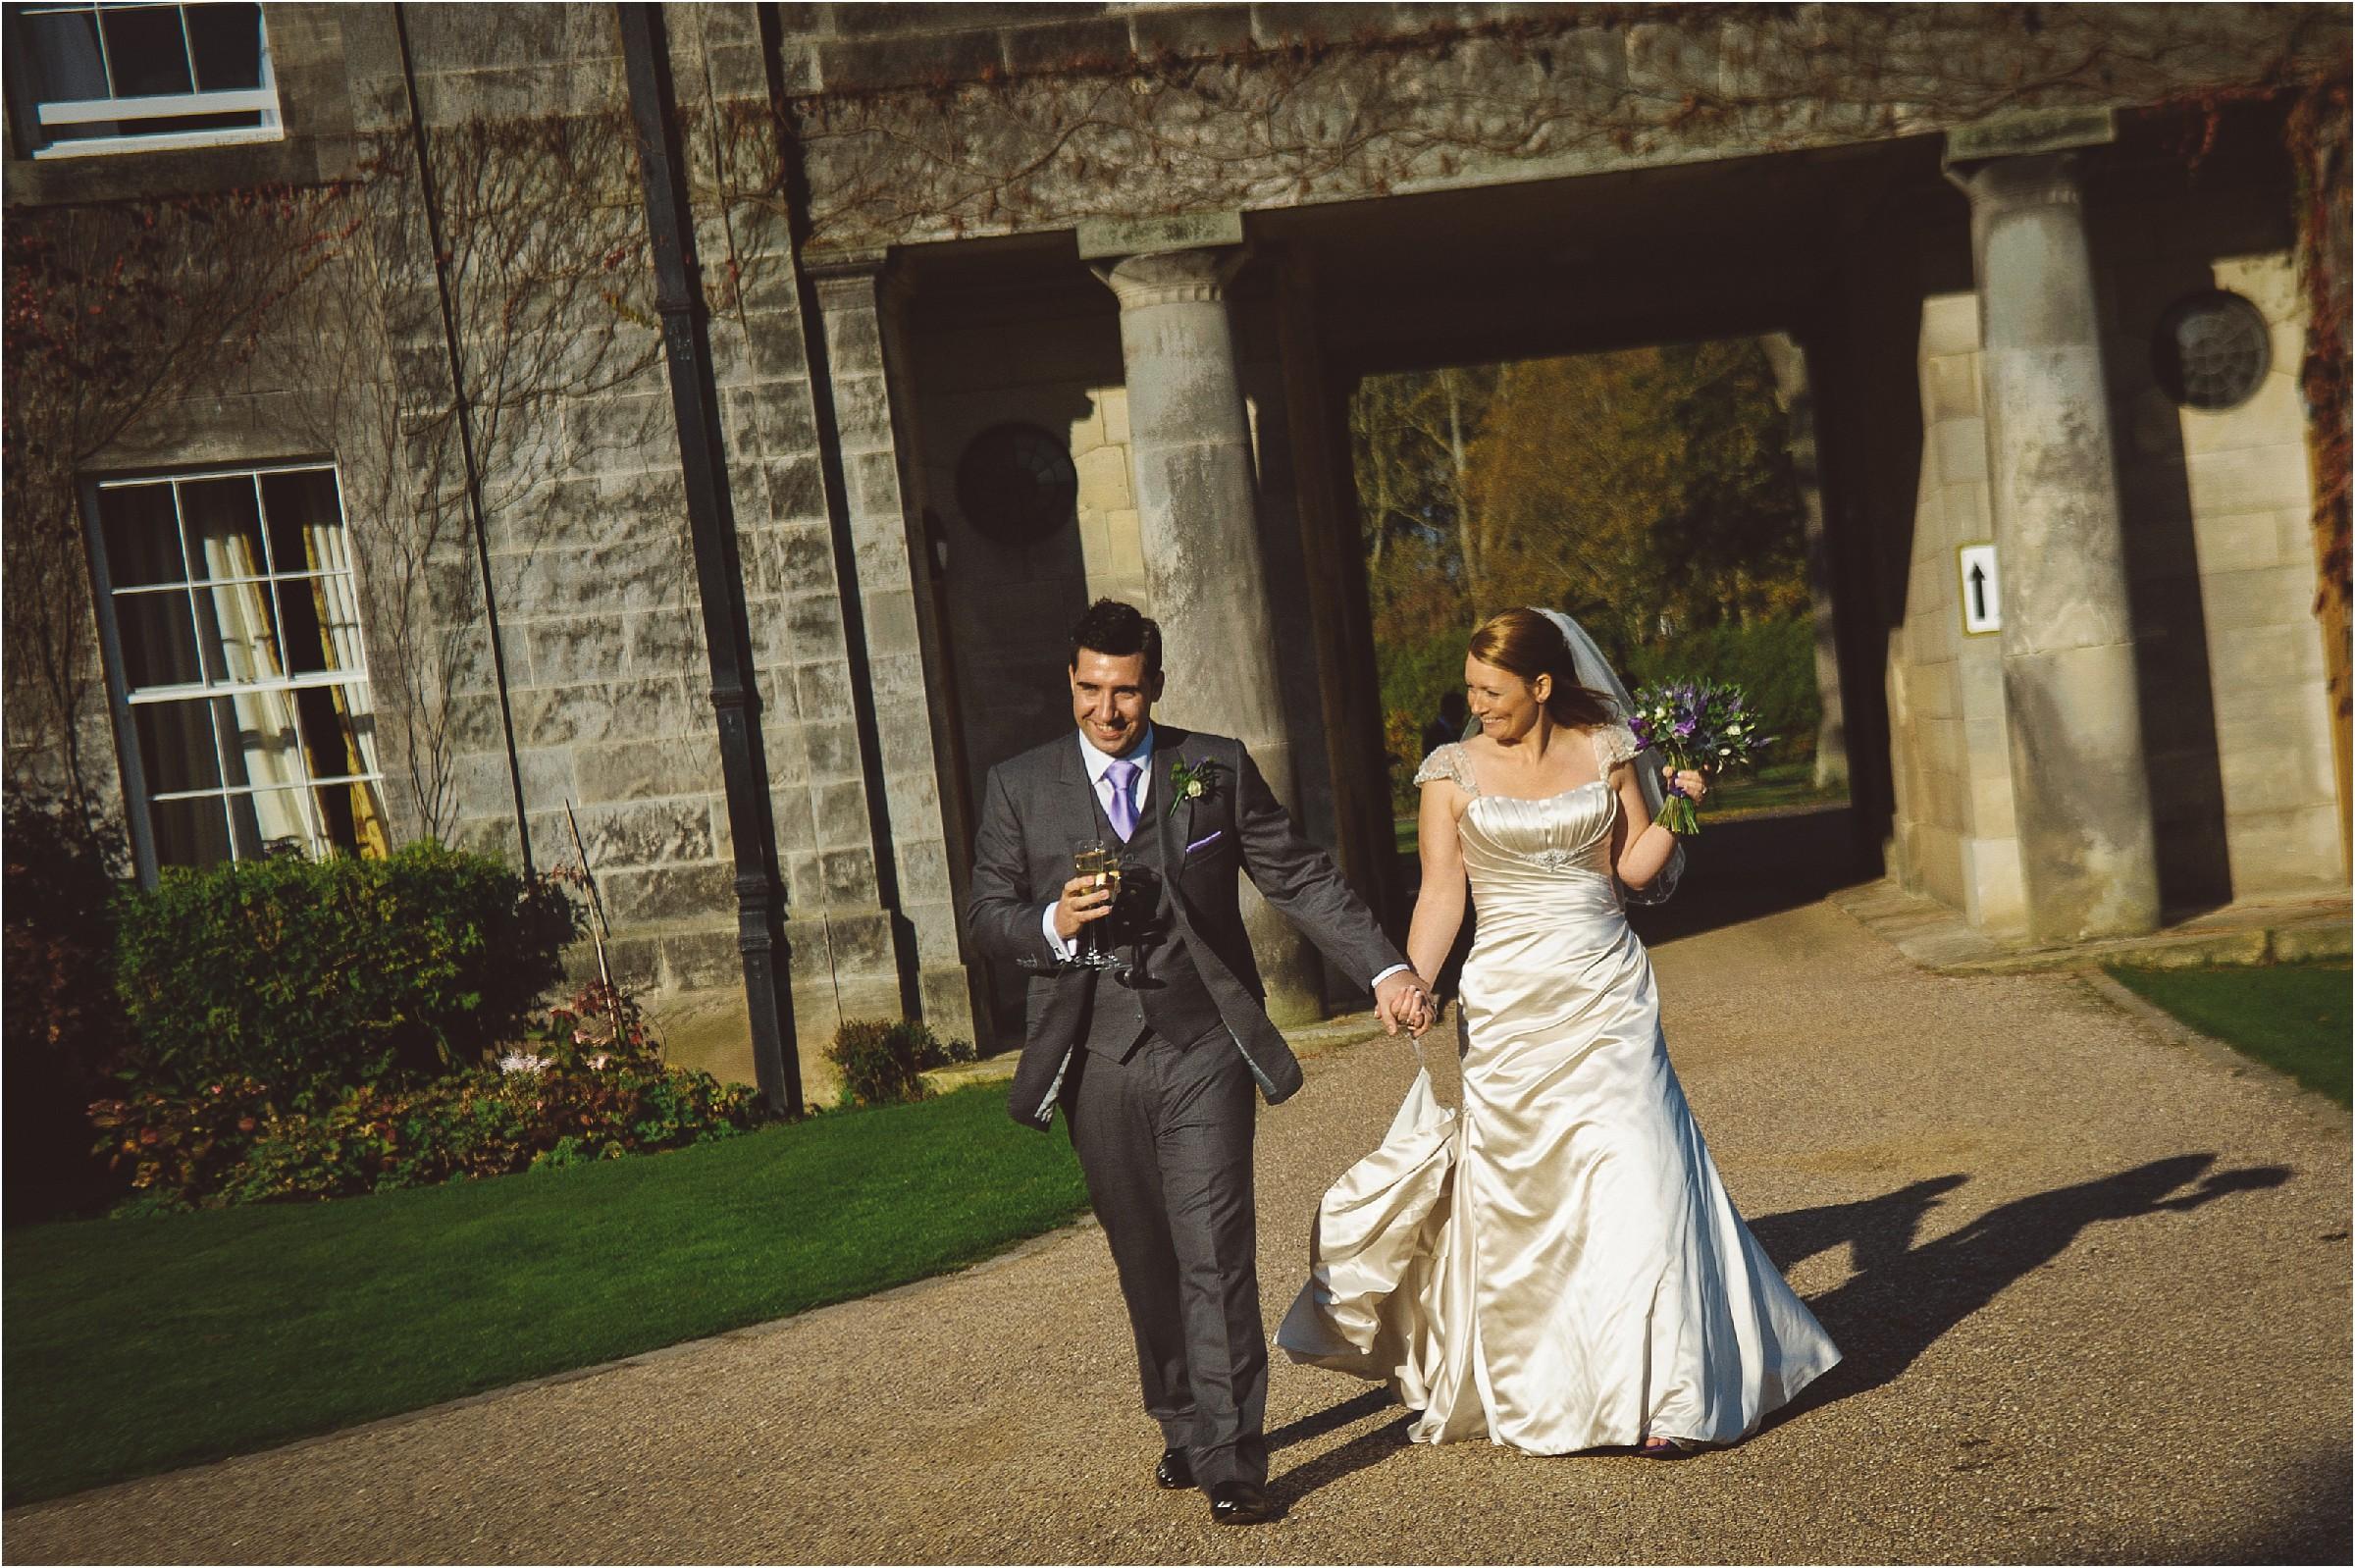 031 wedding photography doxford hall northumberlandDSC_0714e